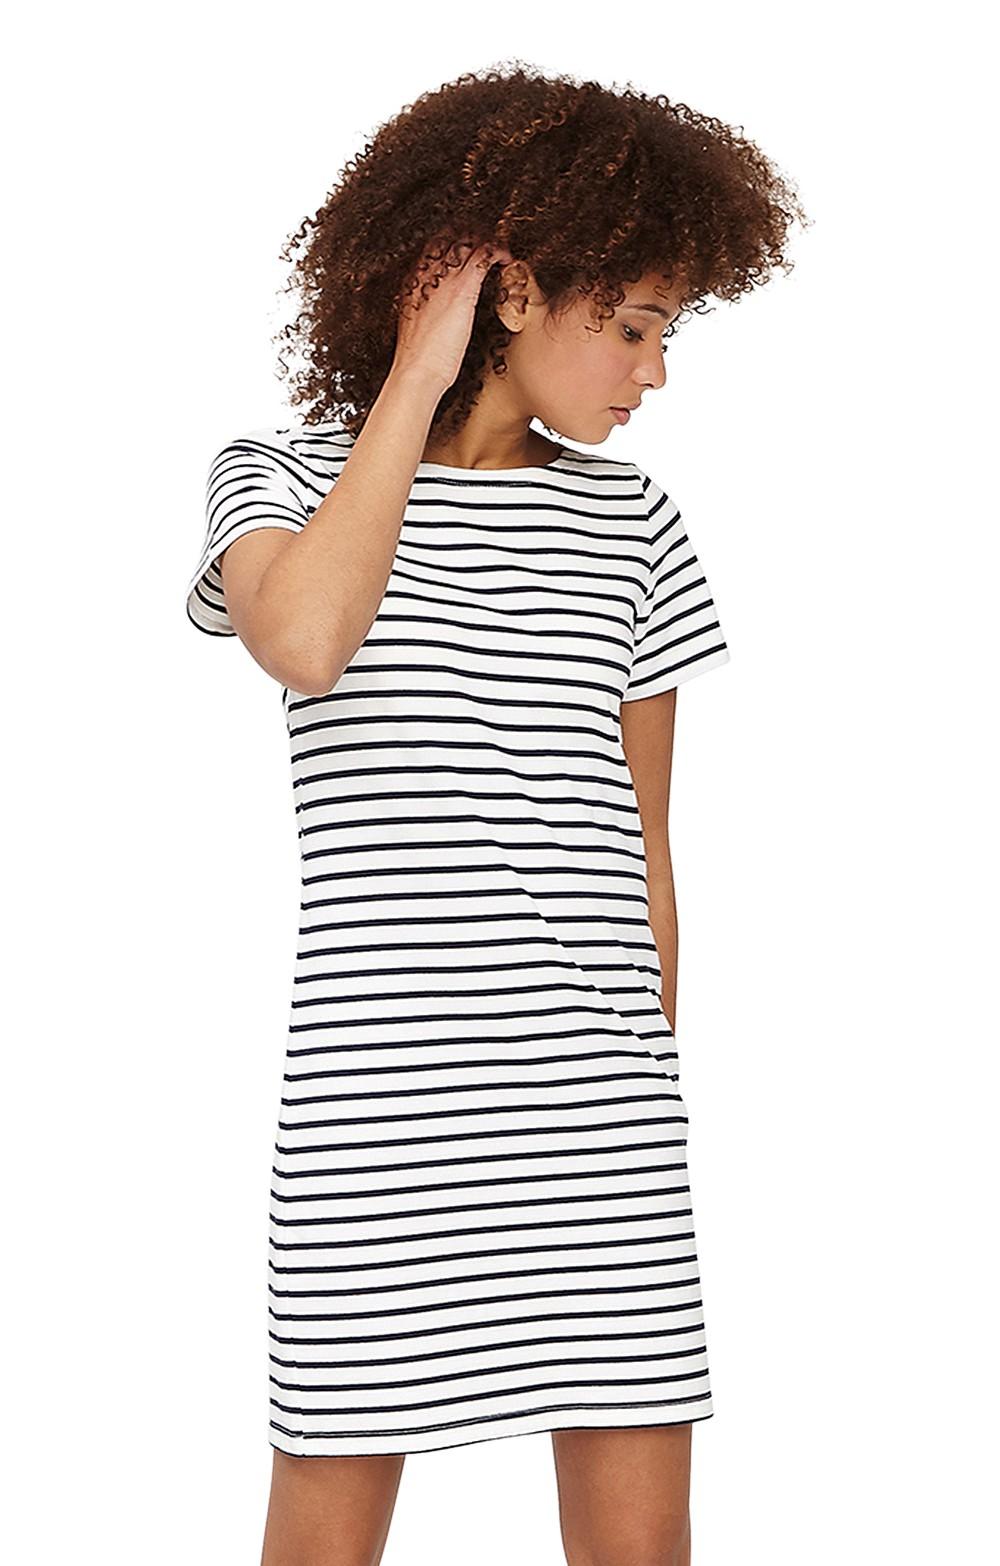 22704b81cf8365 Joules Riviera T-Shirt Dress - House of Bruar